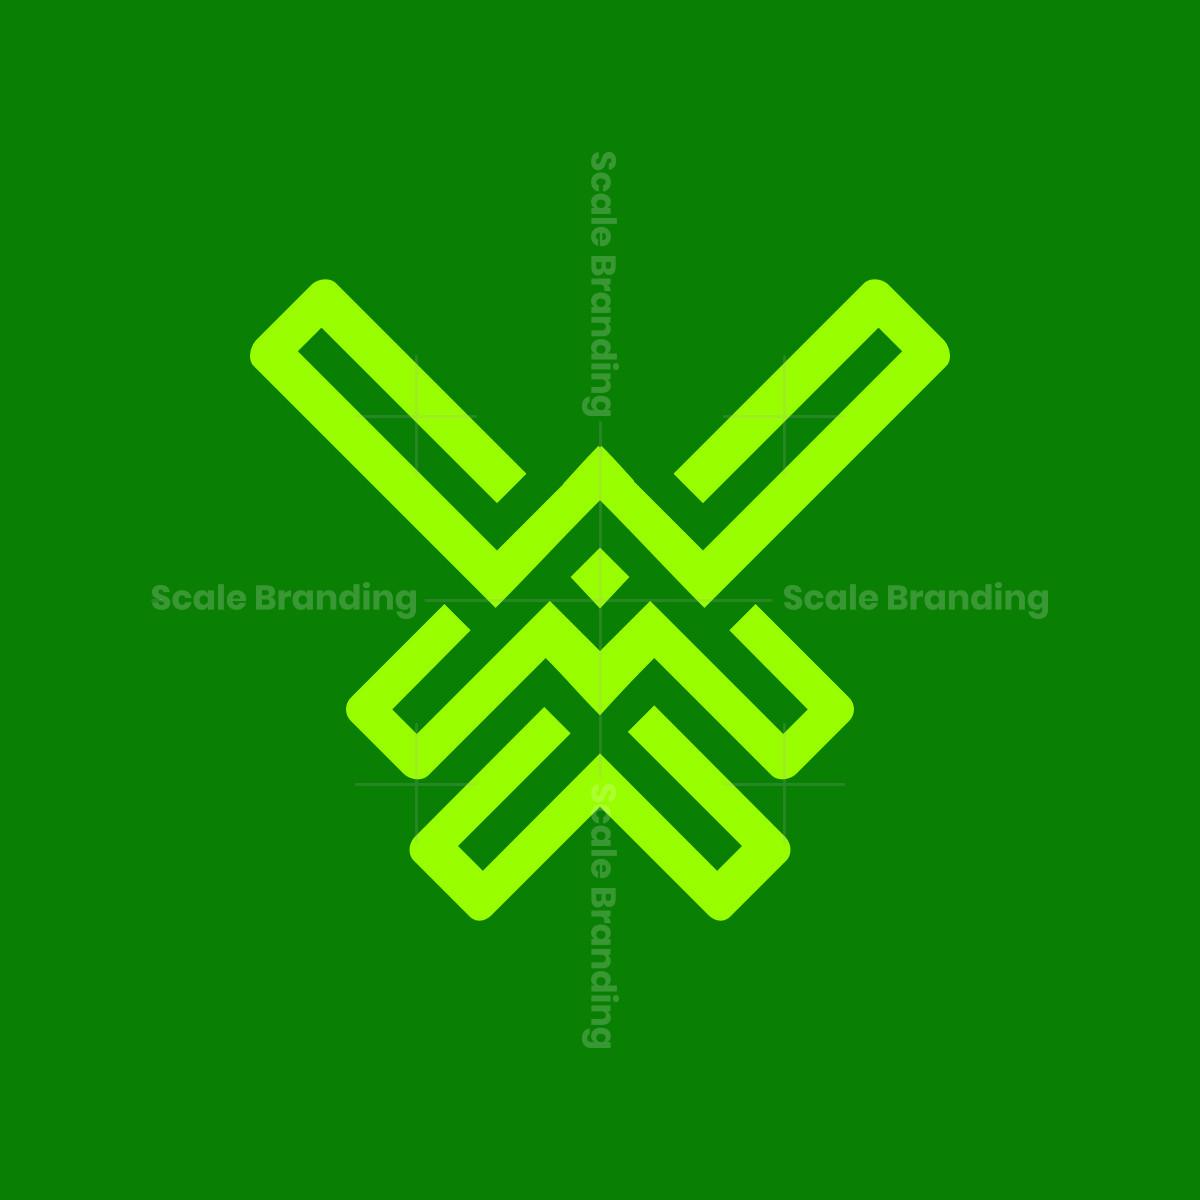 w m w letter logo